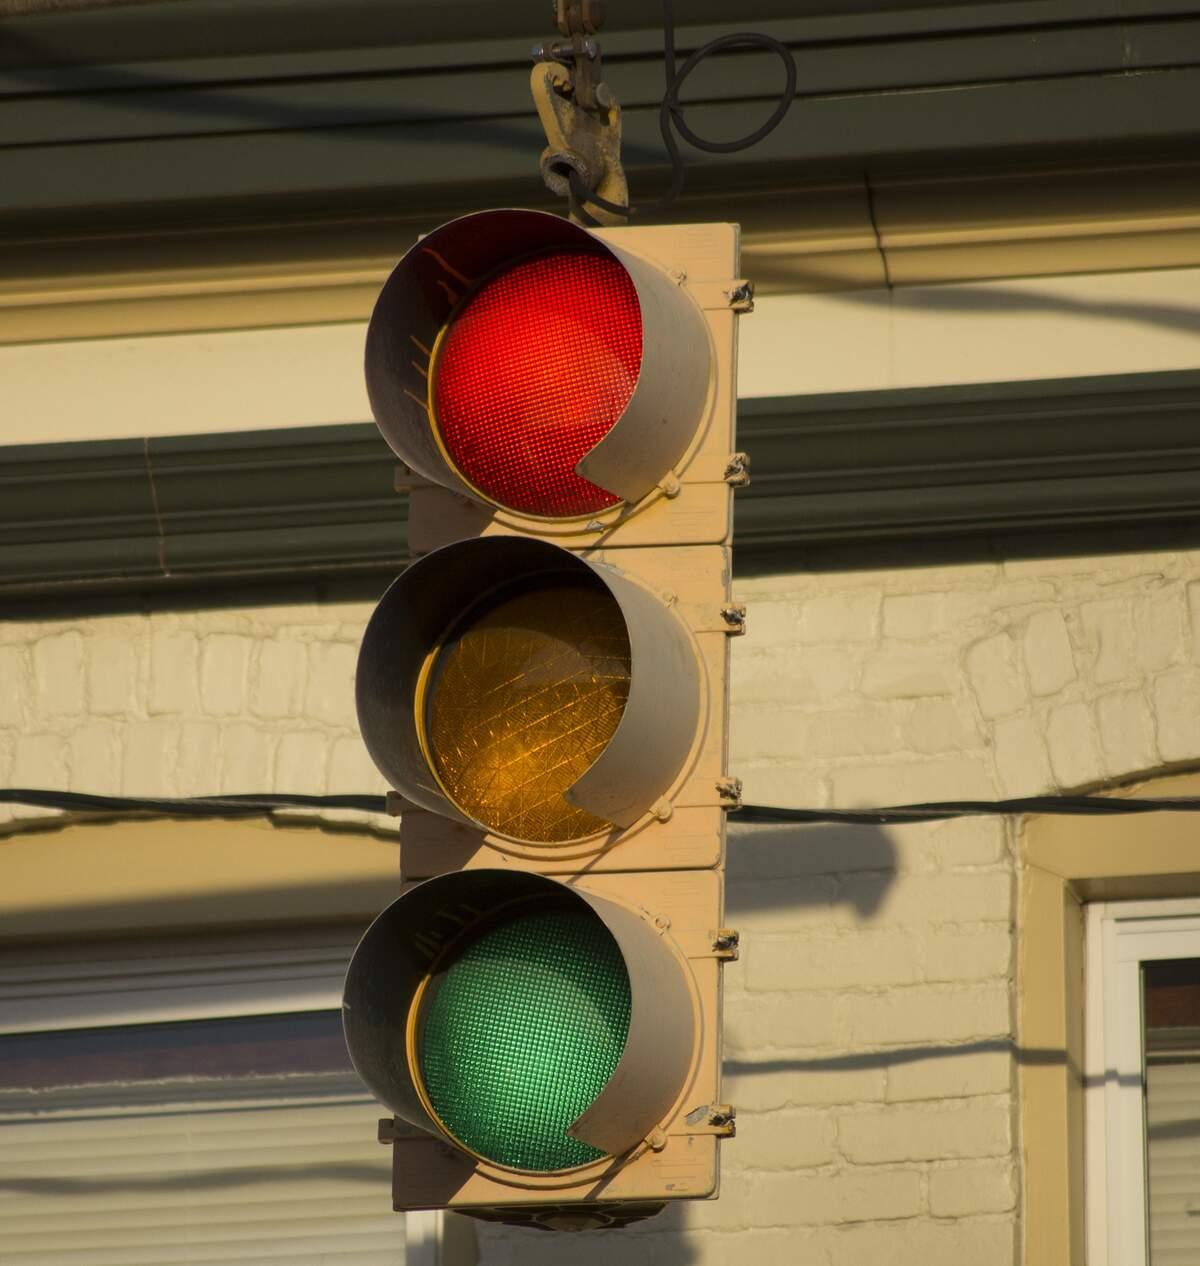 Image for International Traffic Light Day